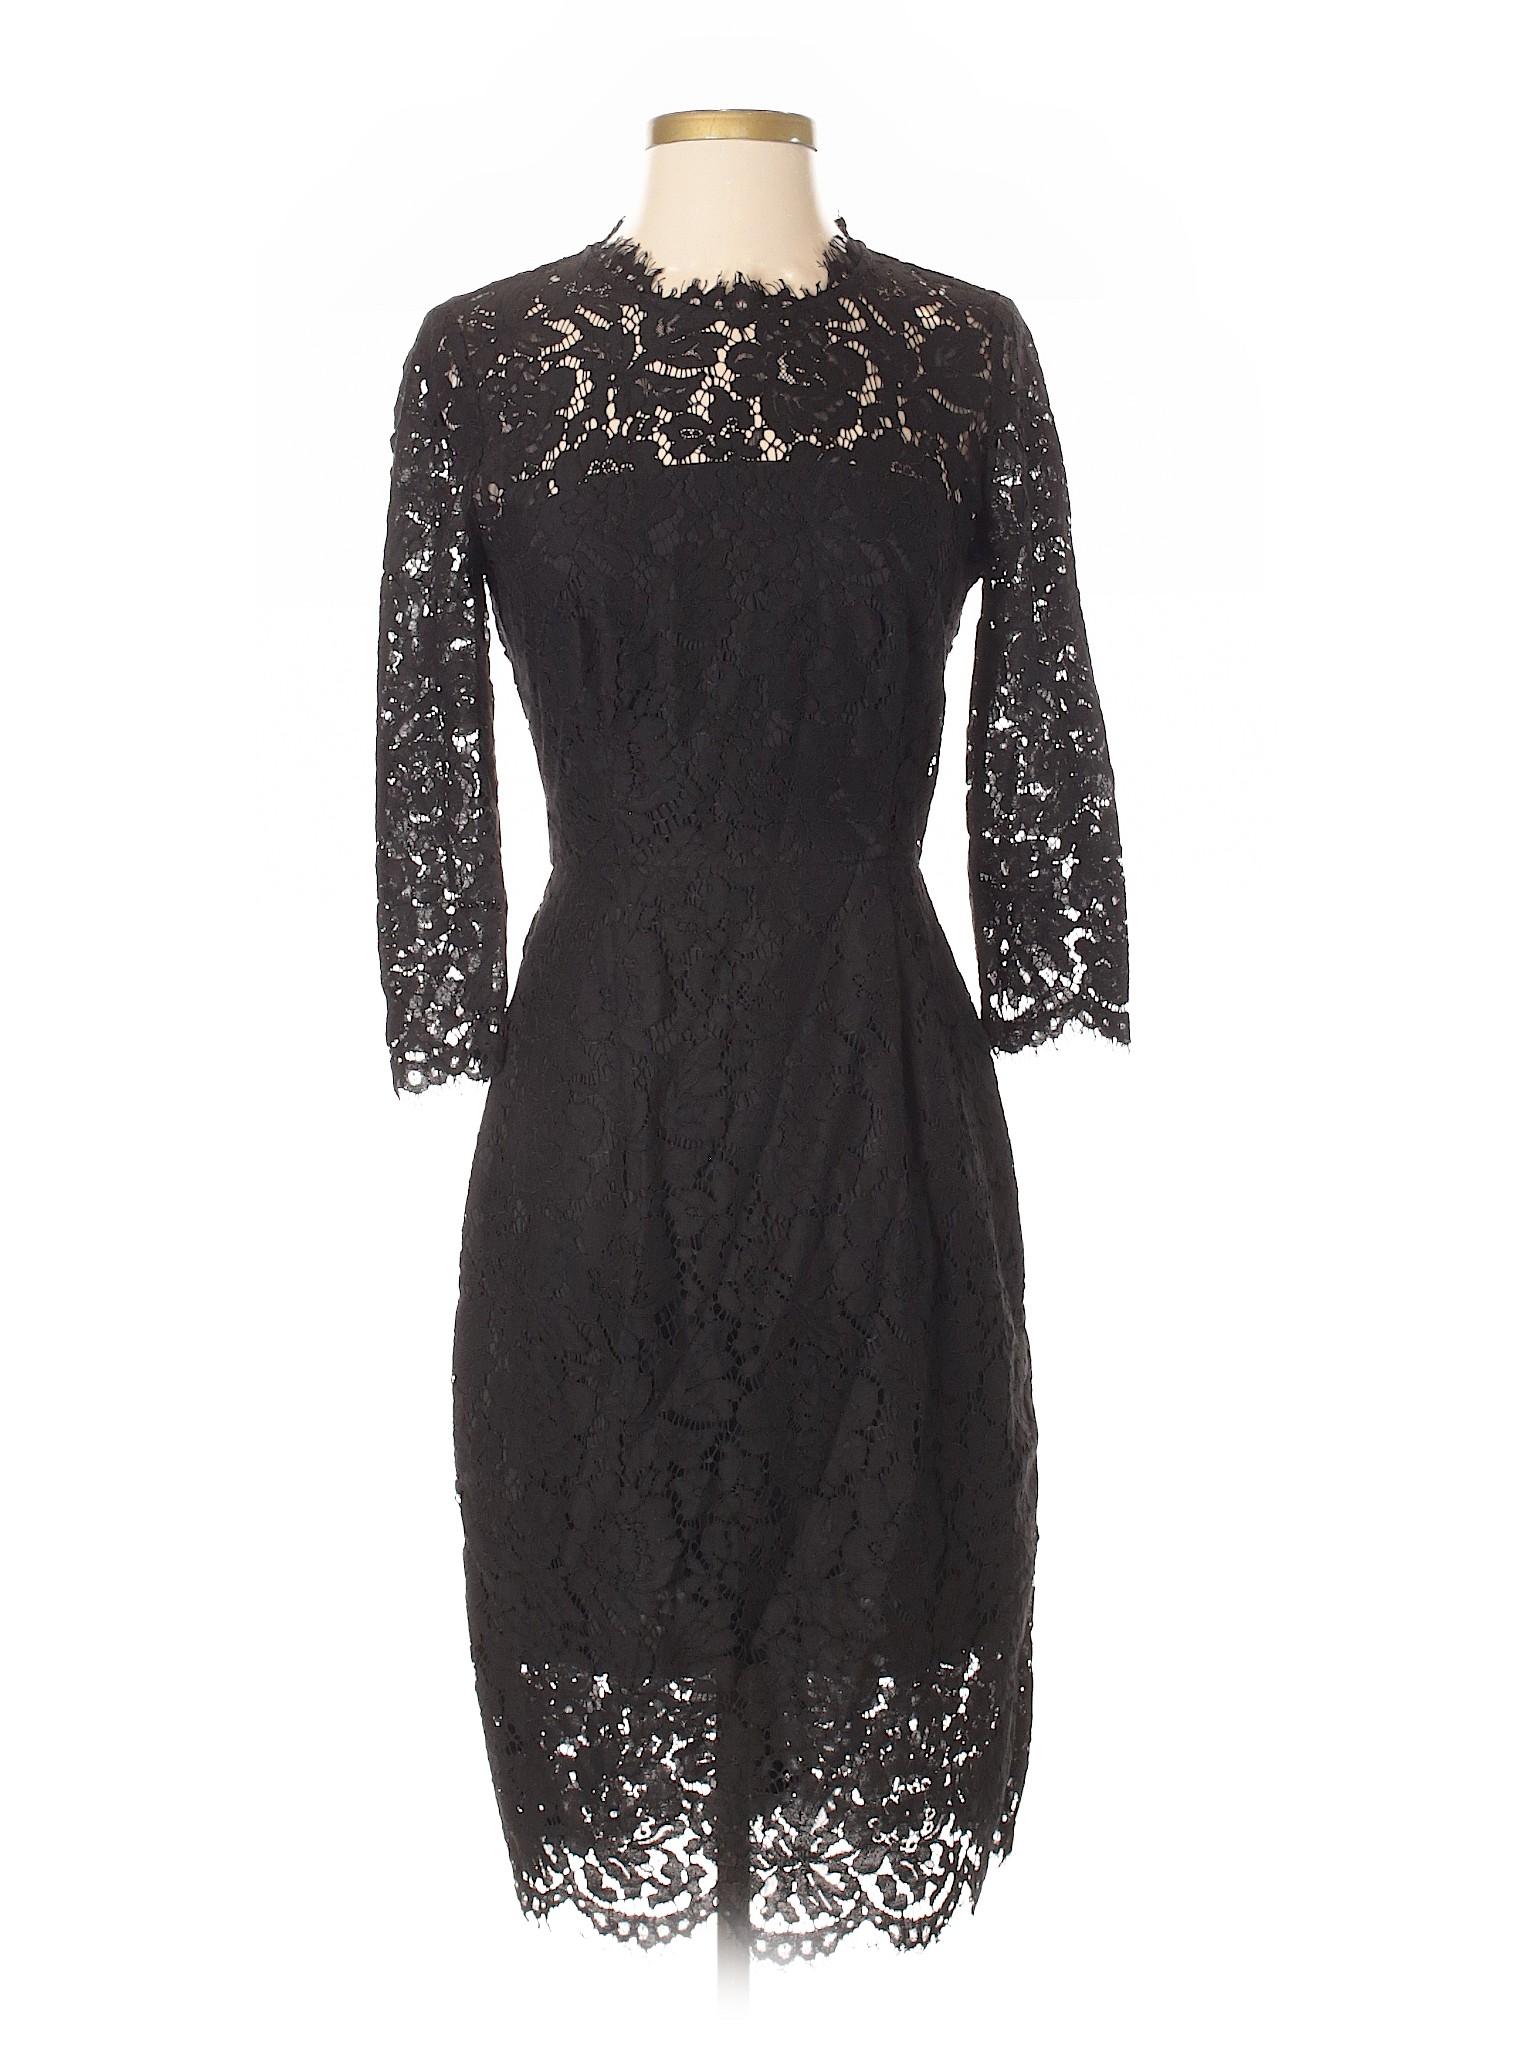 Selling Rachel Zoe Selling Casual Rachel Dress 5BqWzRW